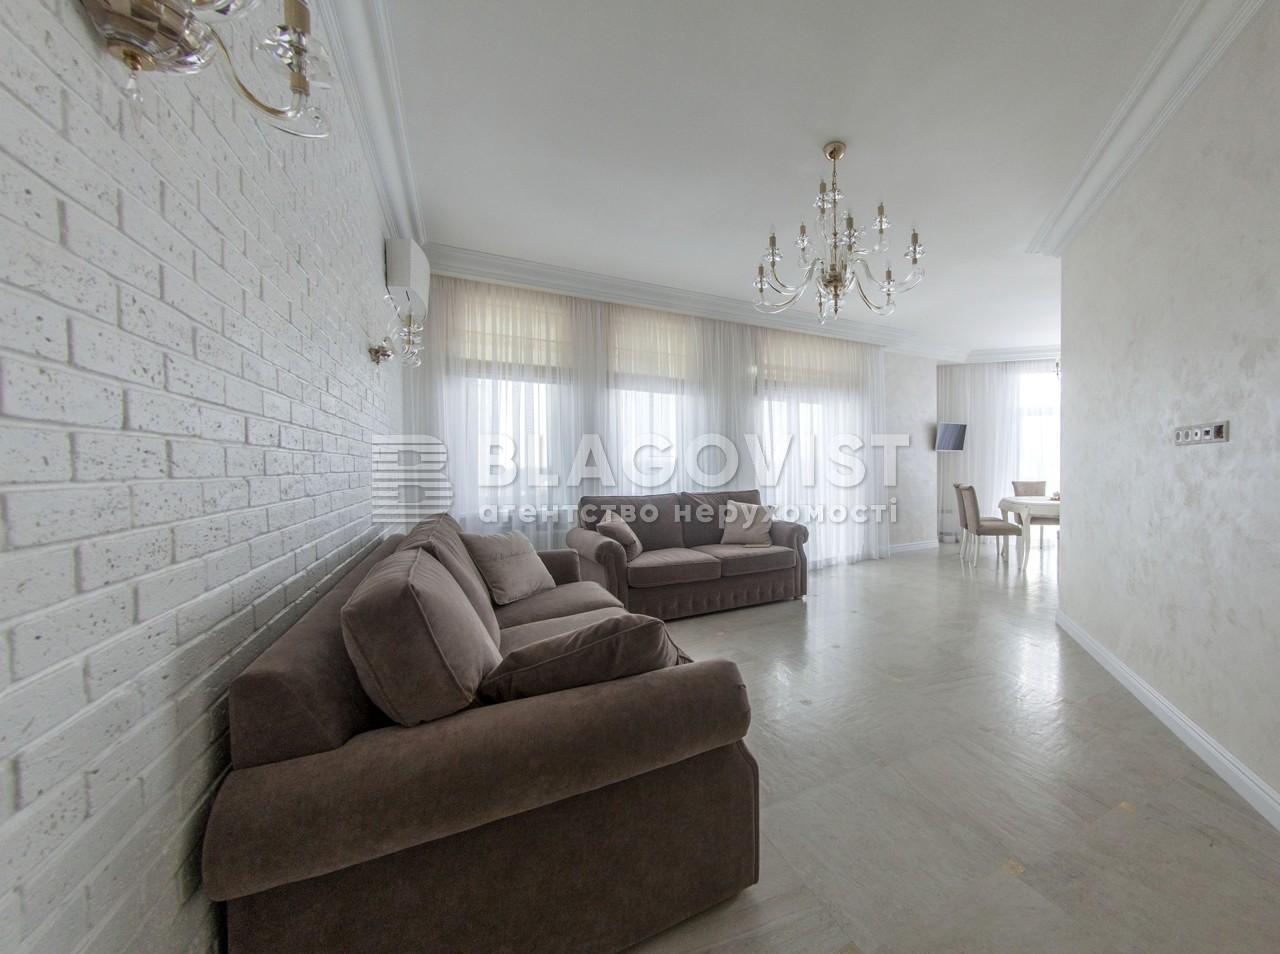 Квартира P-12814, Зверинецкая, 47, Киев - Фото 8